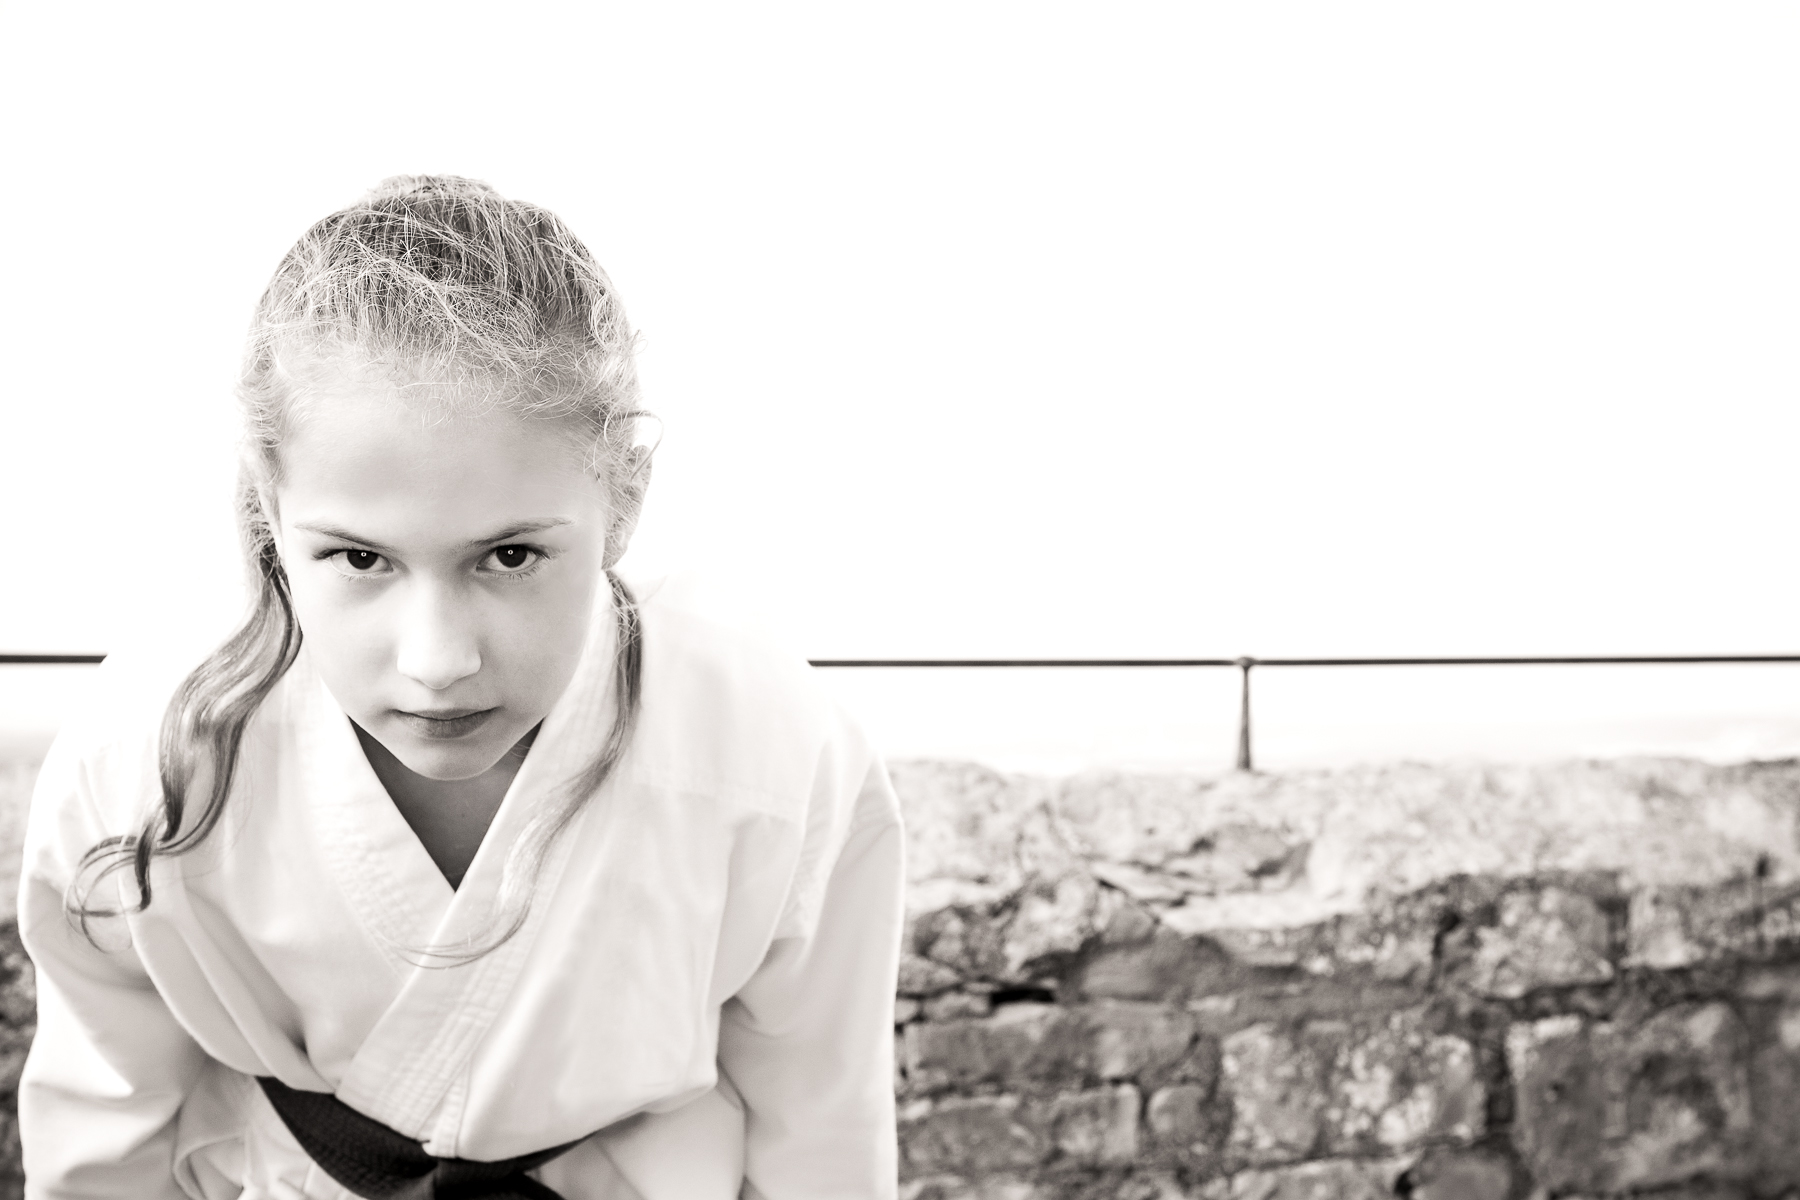 Kurse Karateschule Nürtingen auf Burg Hohen Neuffen